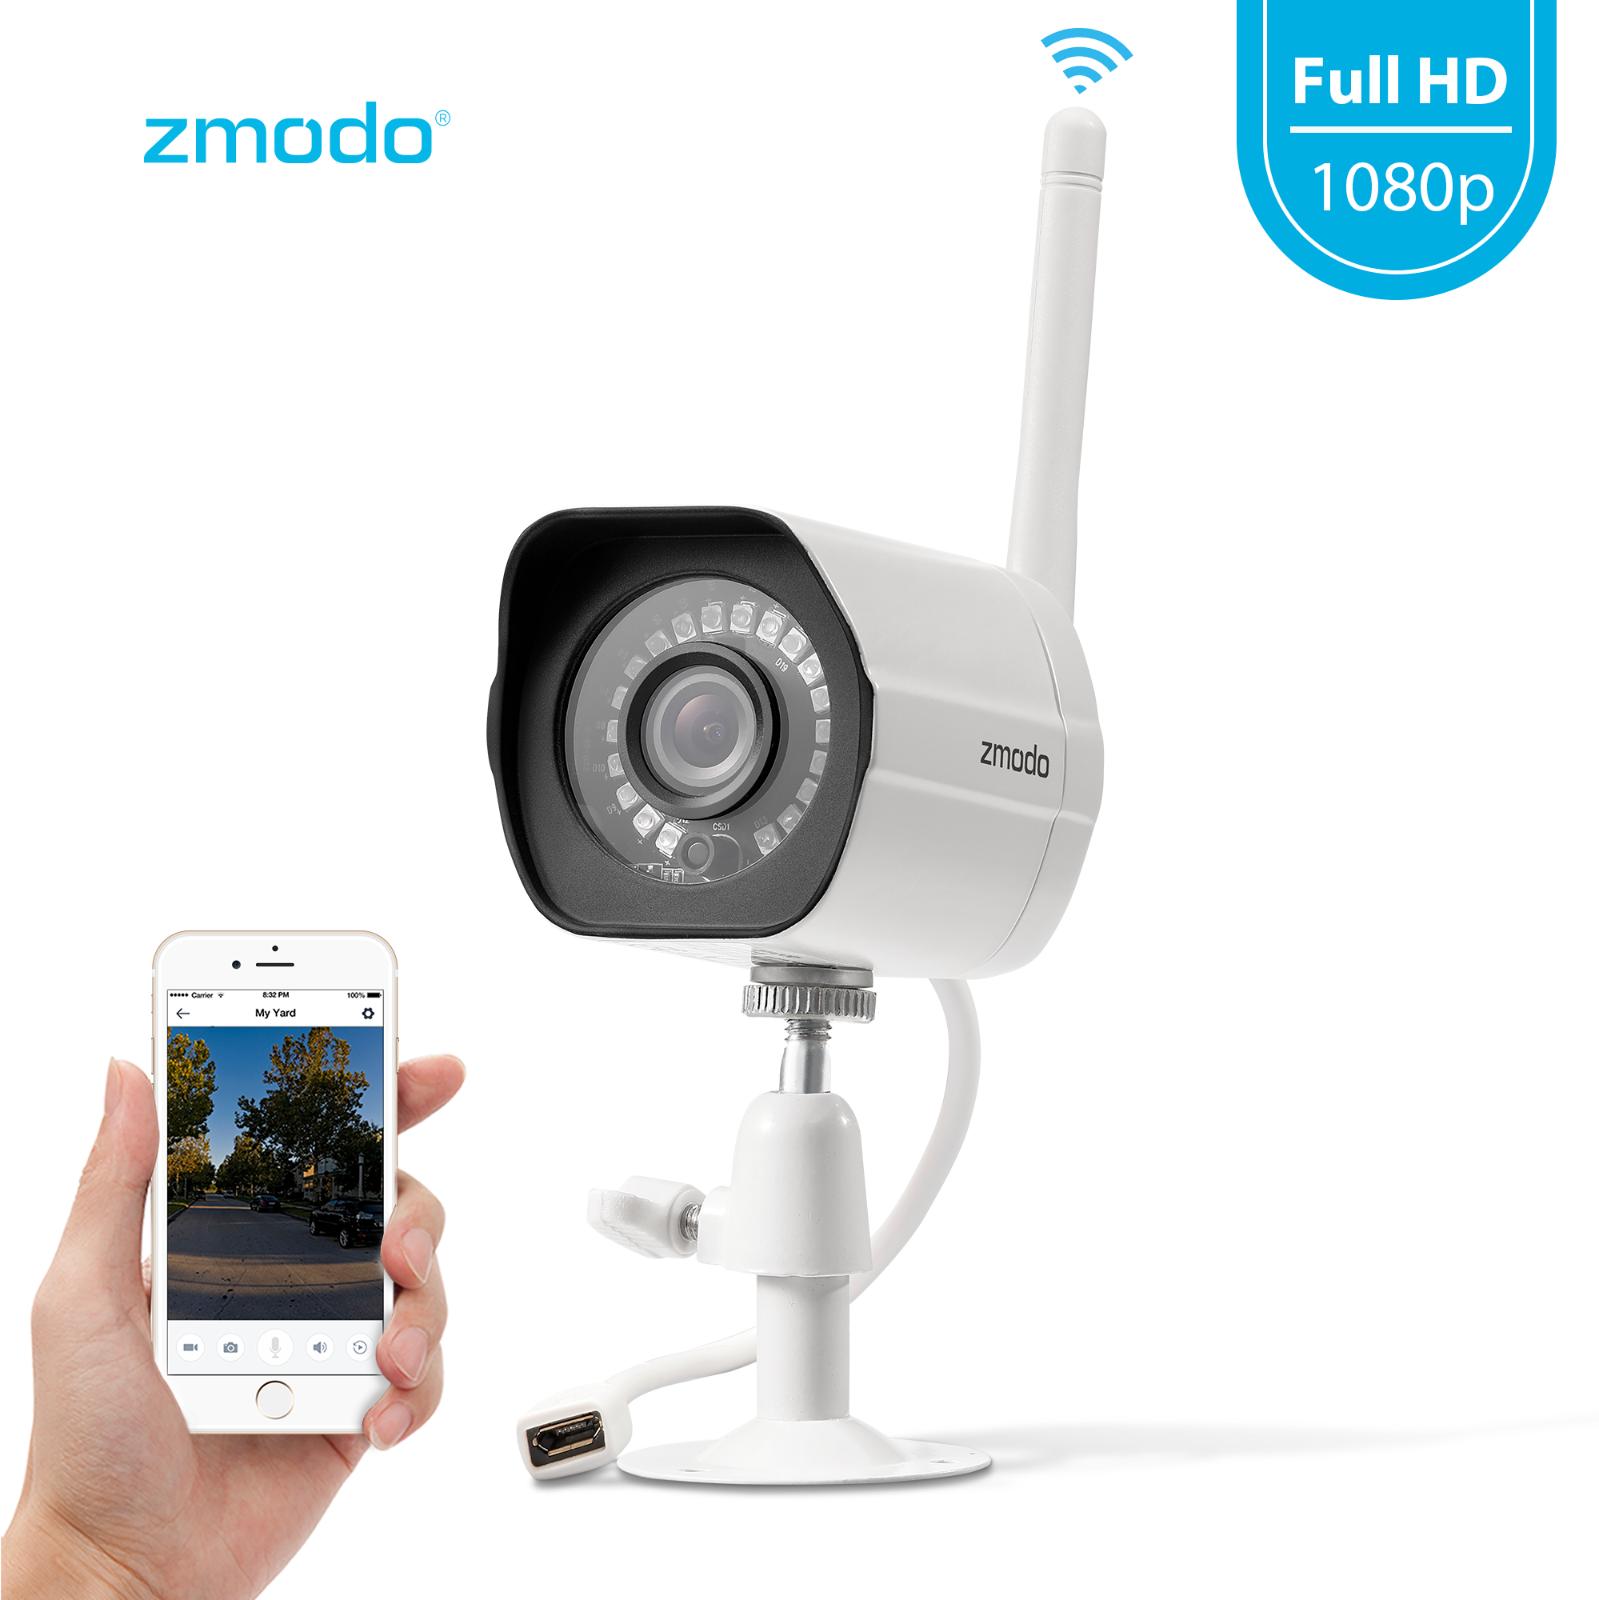 Zmodo 1080p Wireless Outdoor Home Security Camera,Night Visi